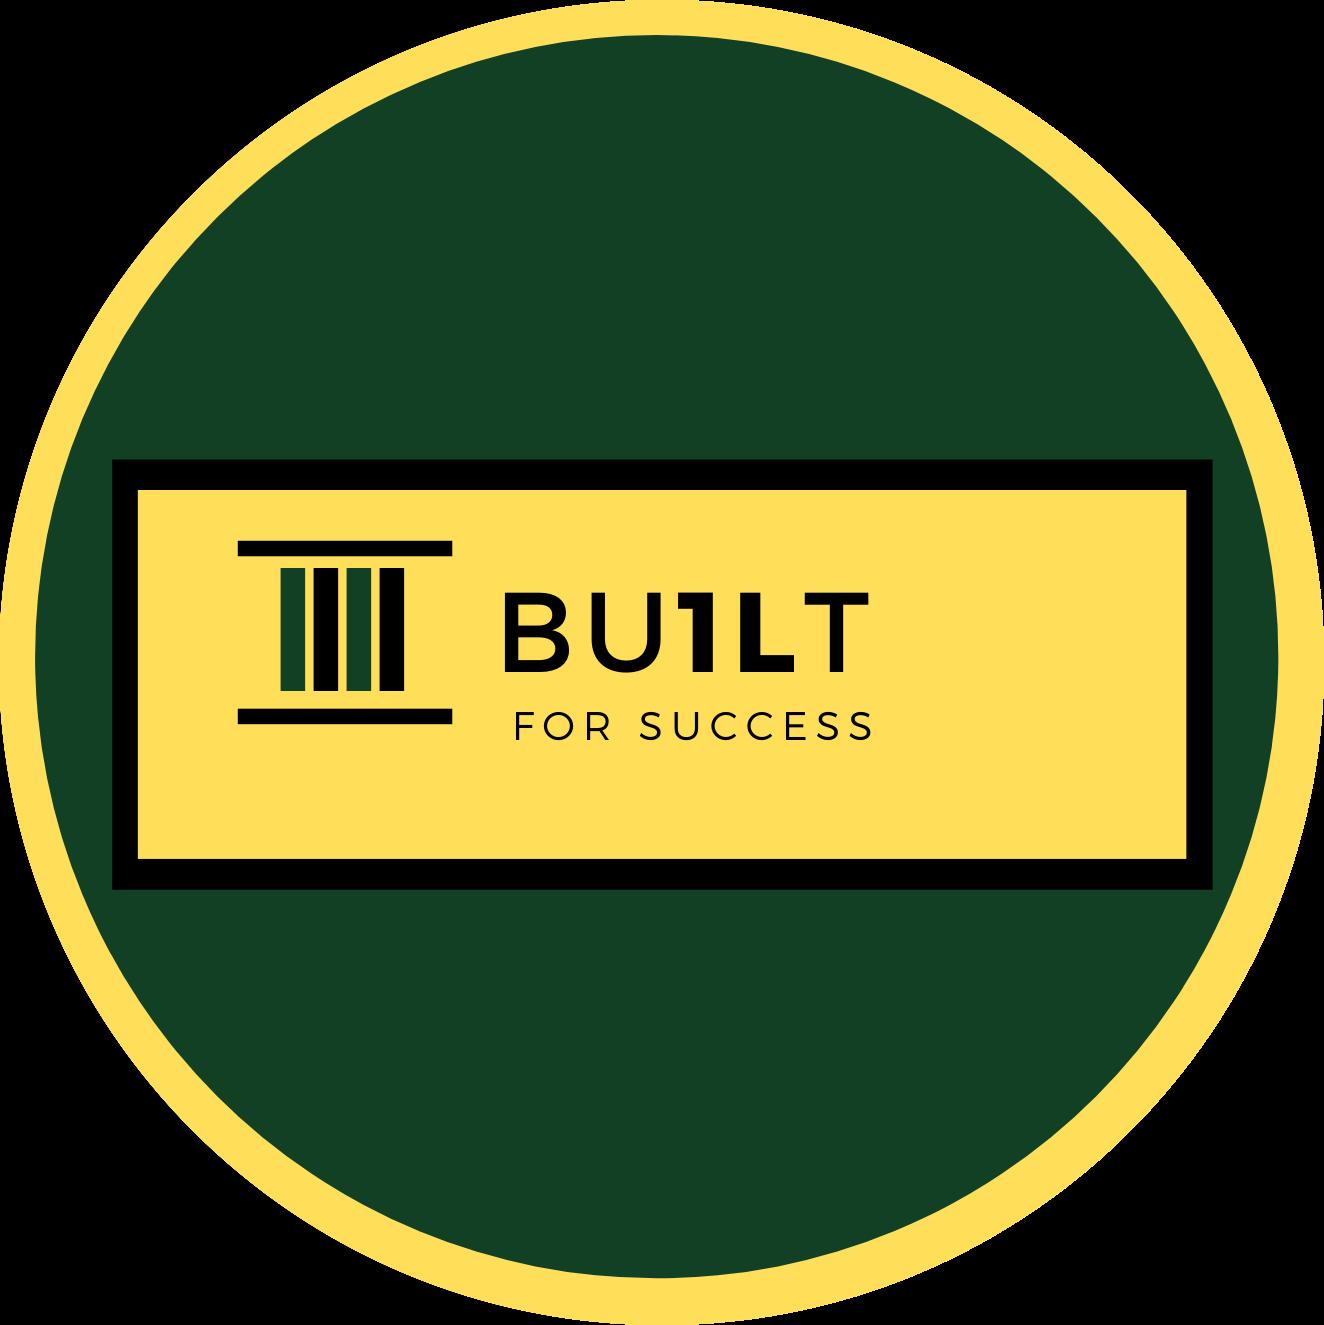 BU1LT For Success